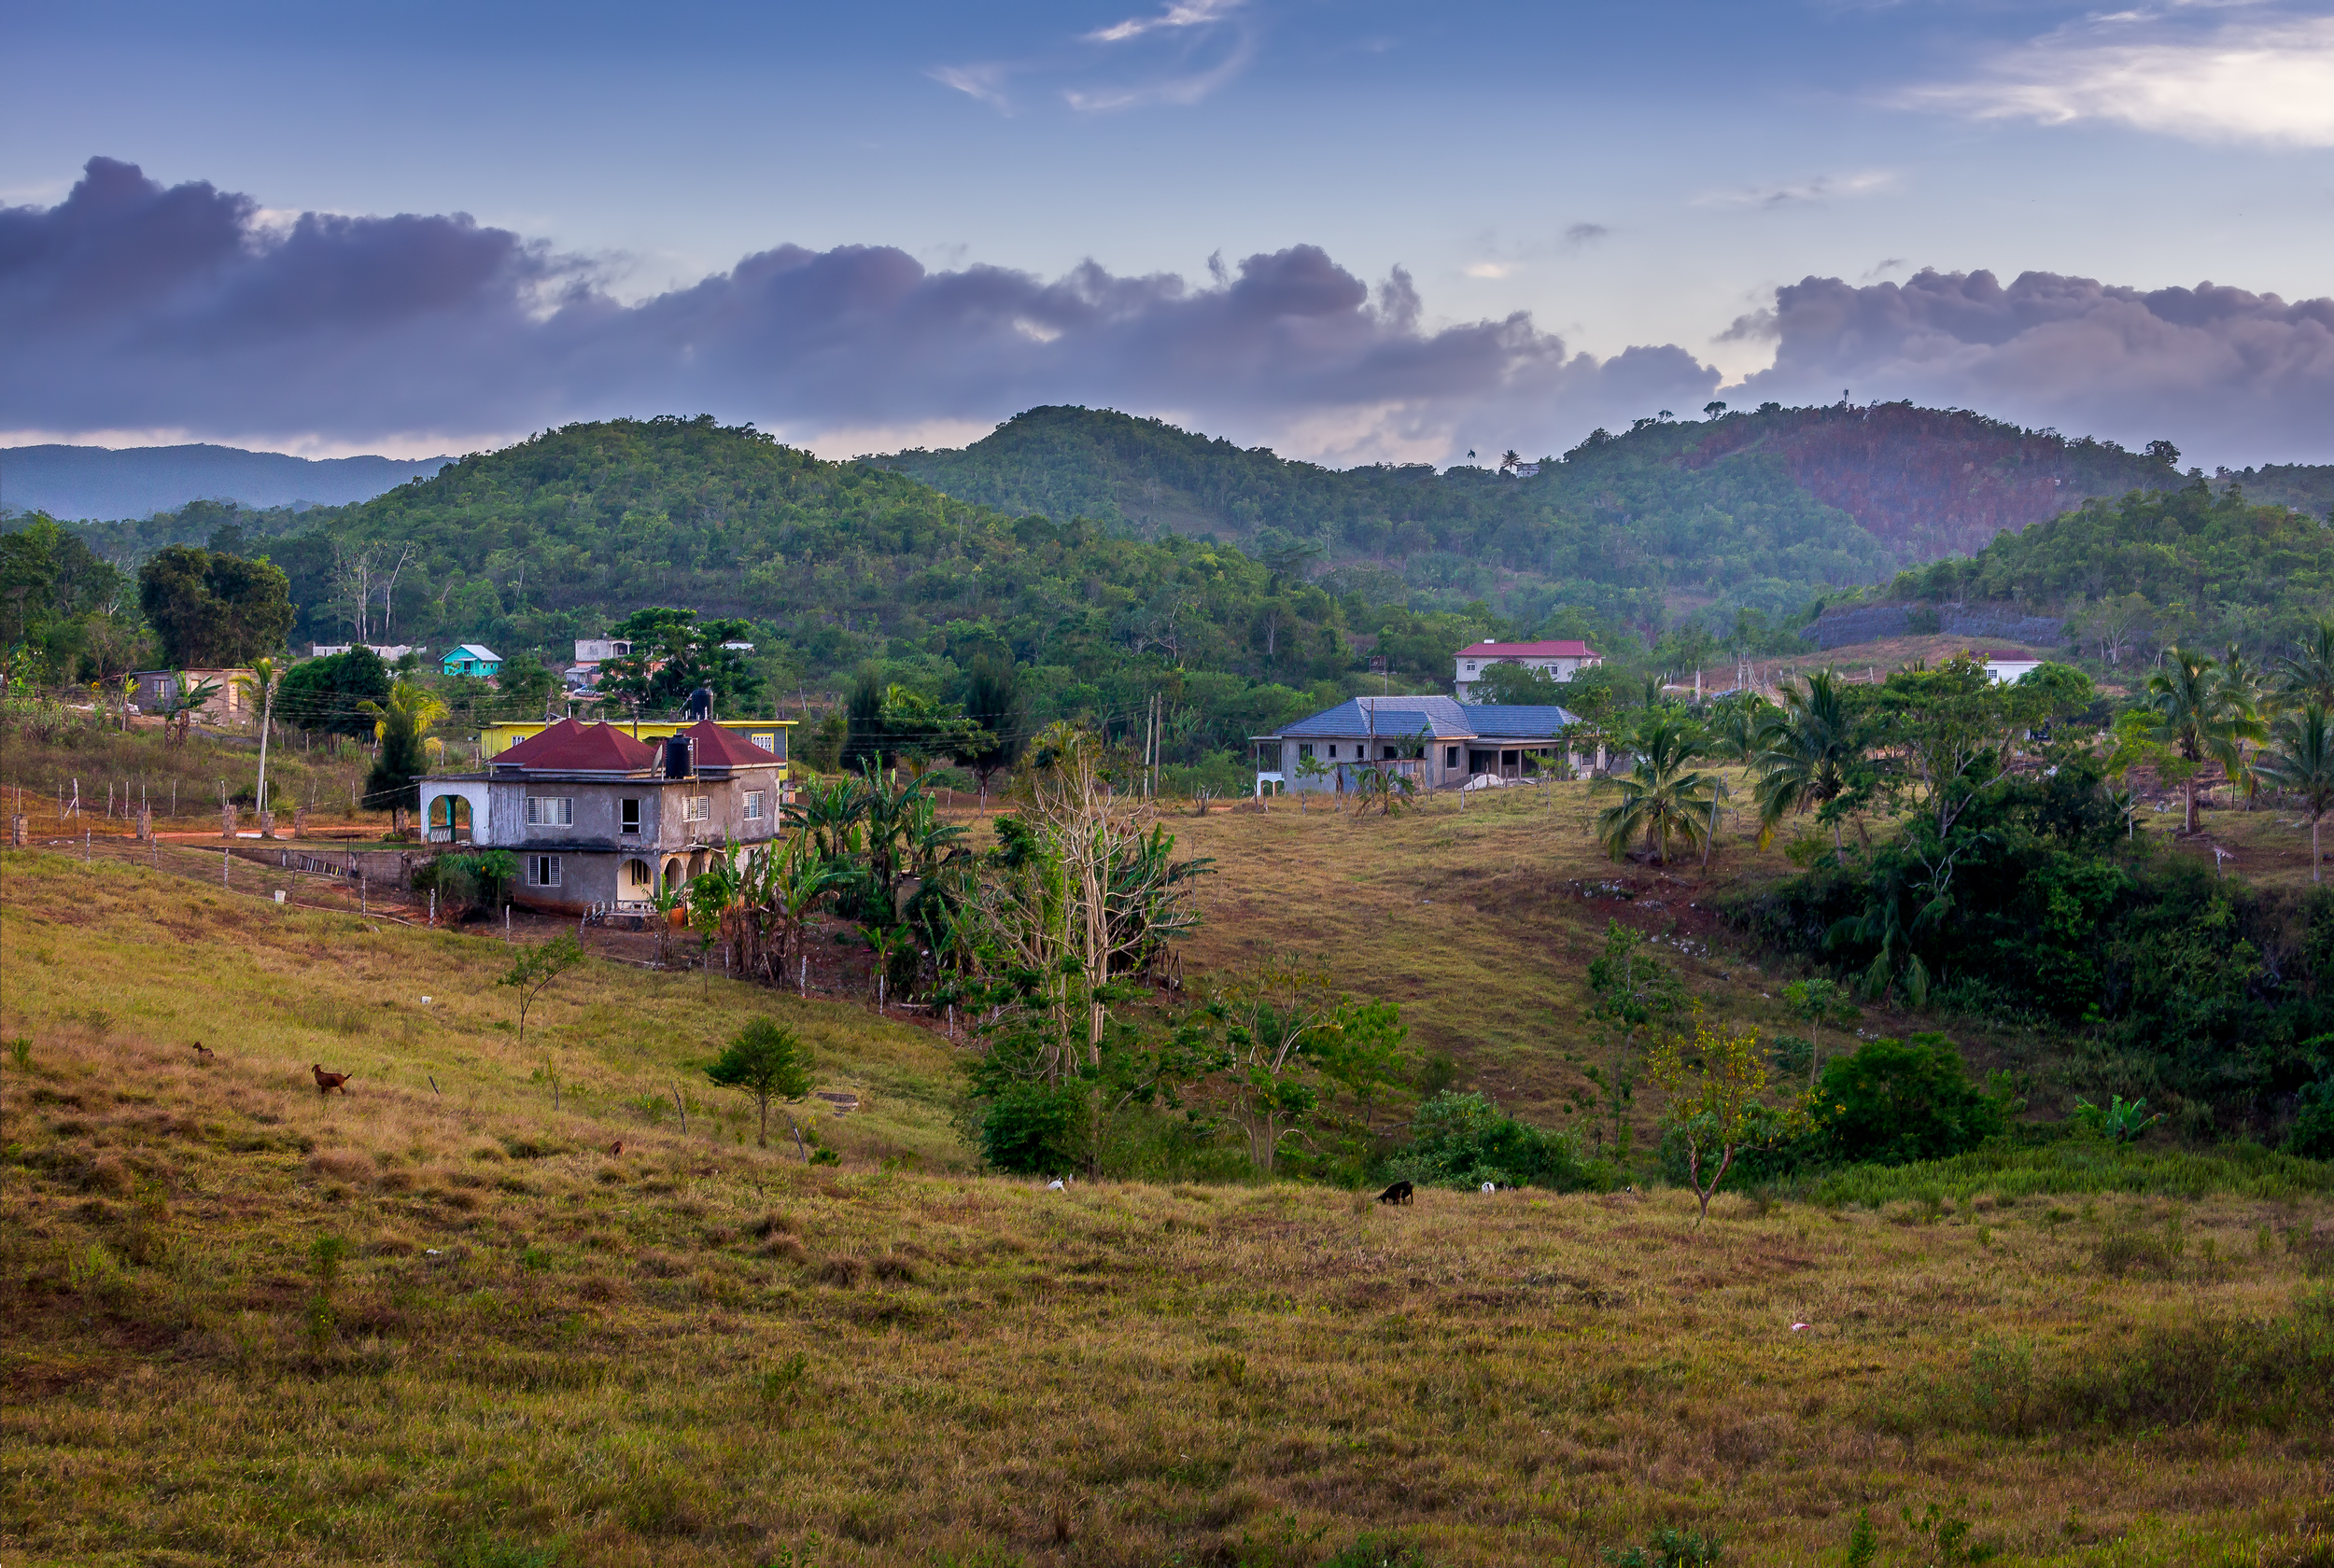 A lovely evening in Steerfield, St Ann, Jamaica